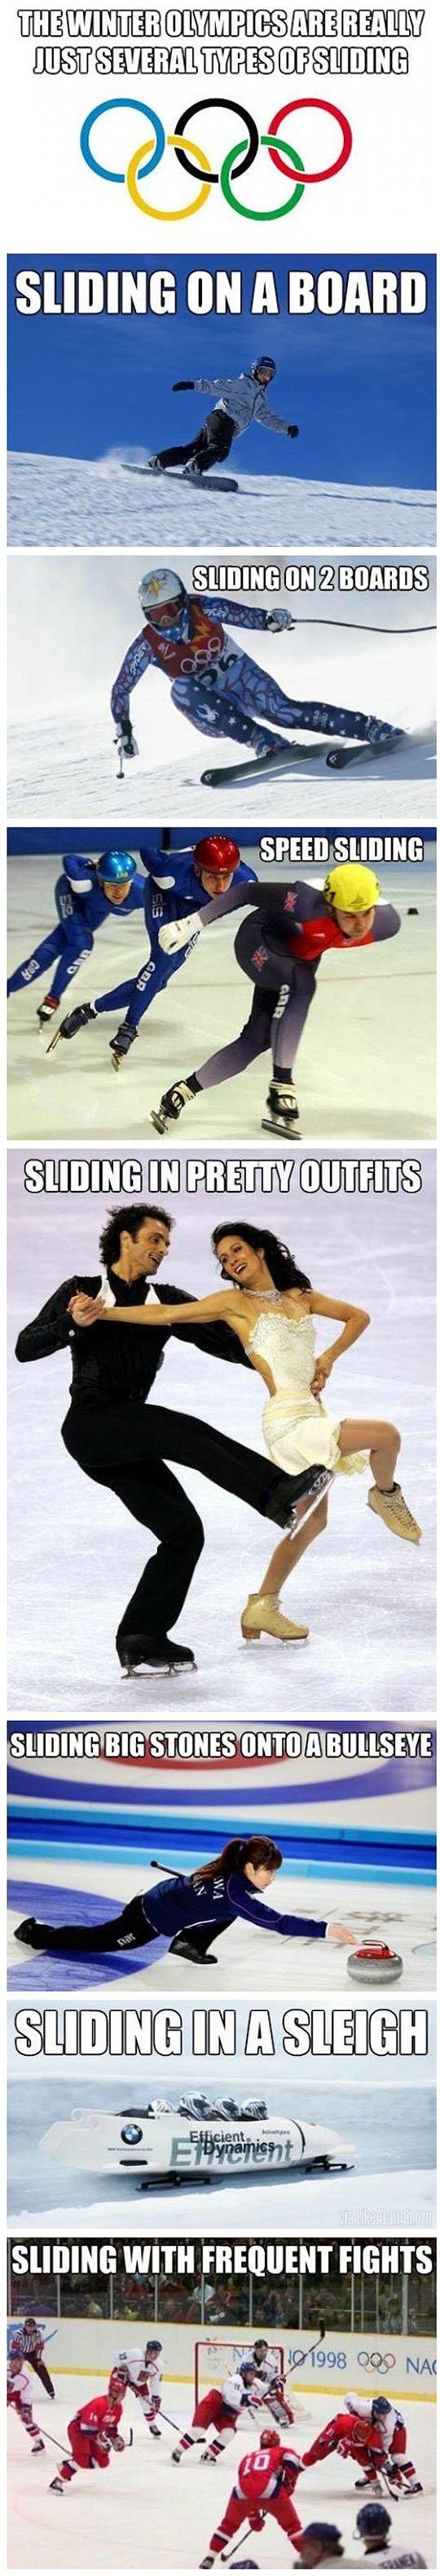 funny-winter-Olympics-Canada-team